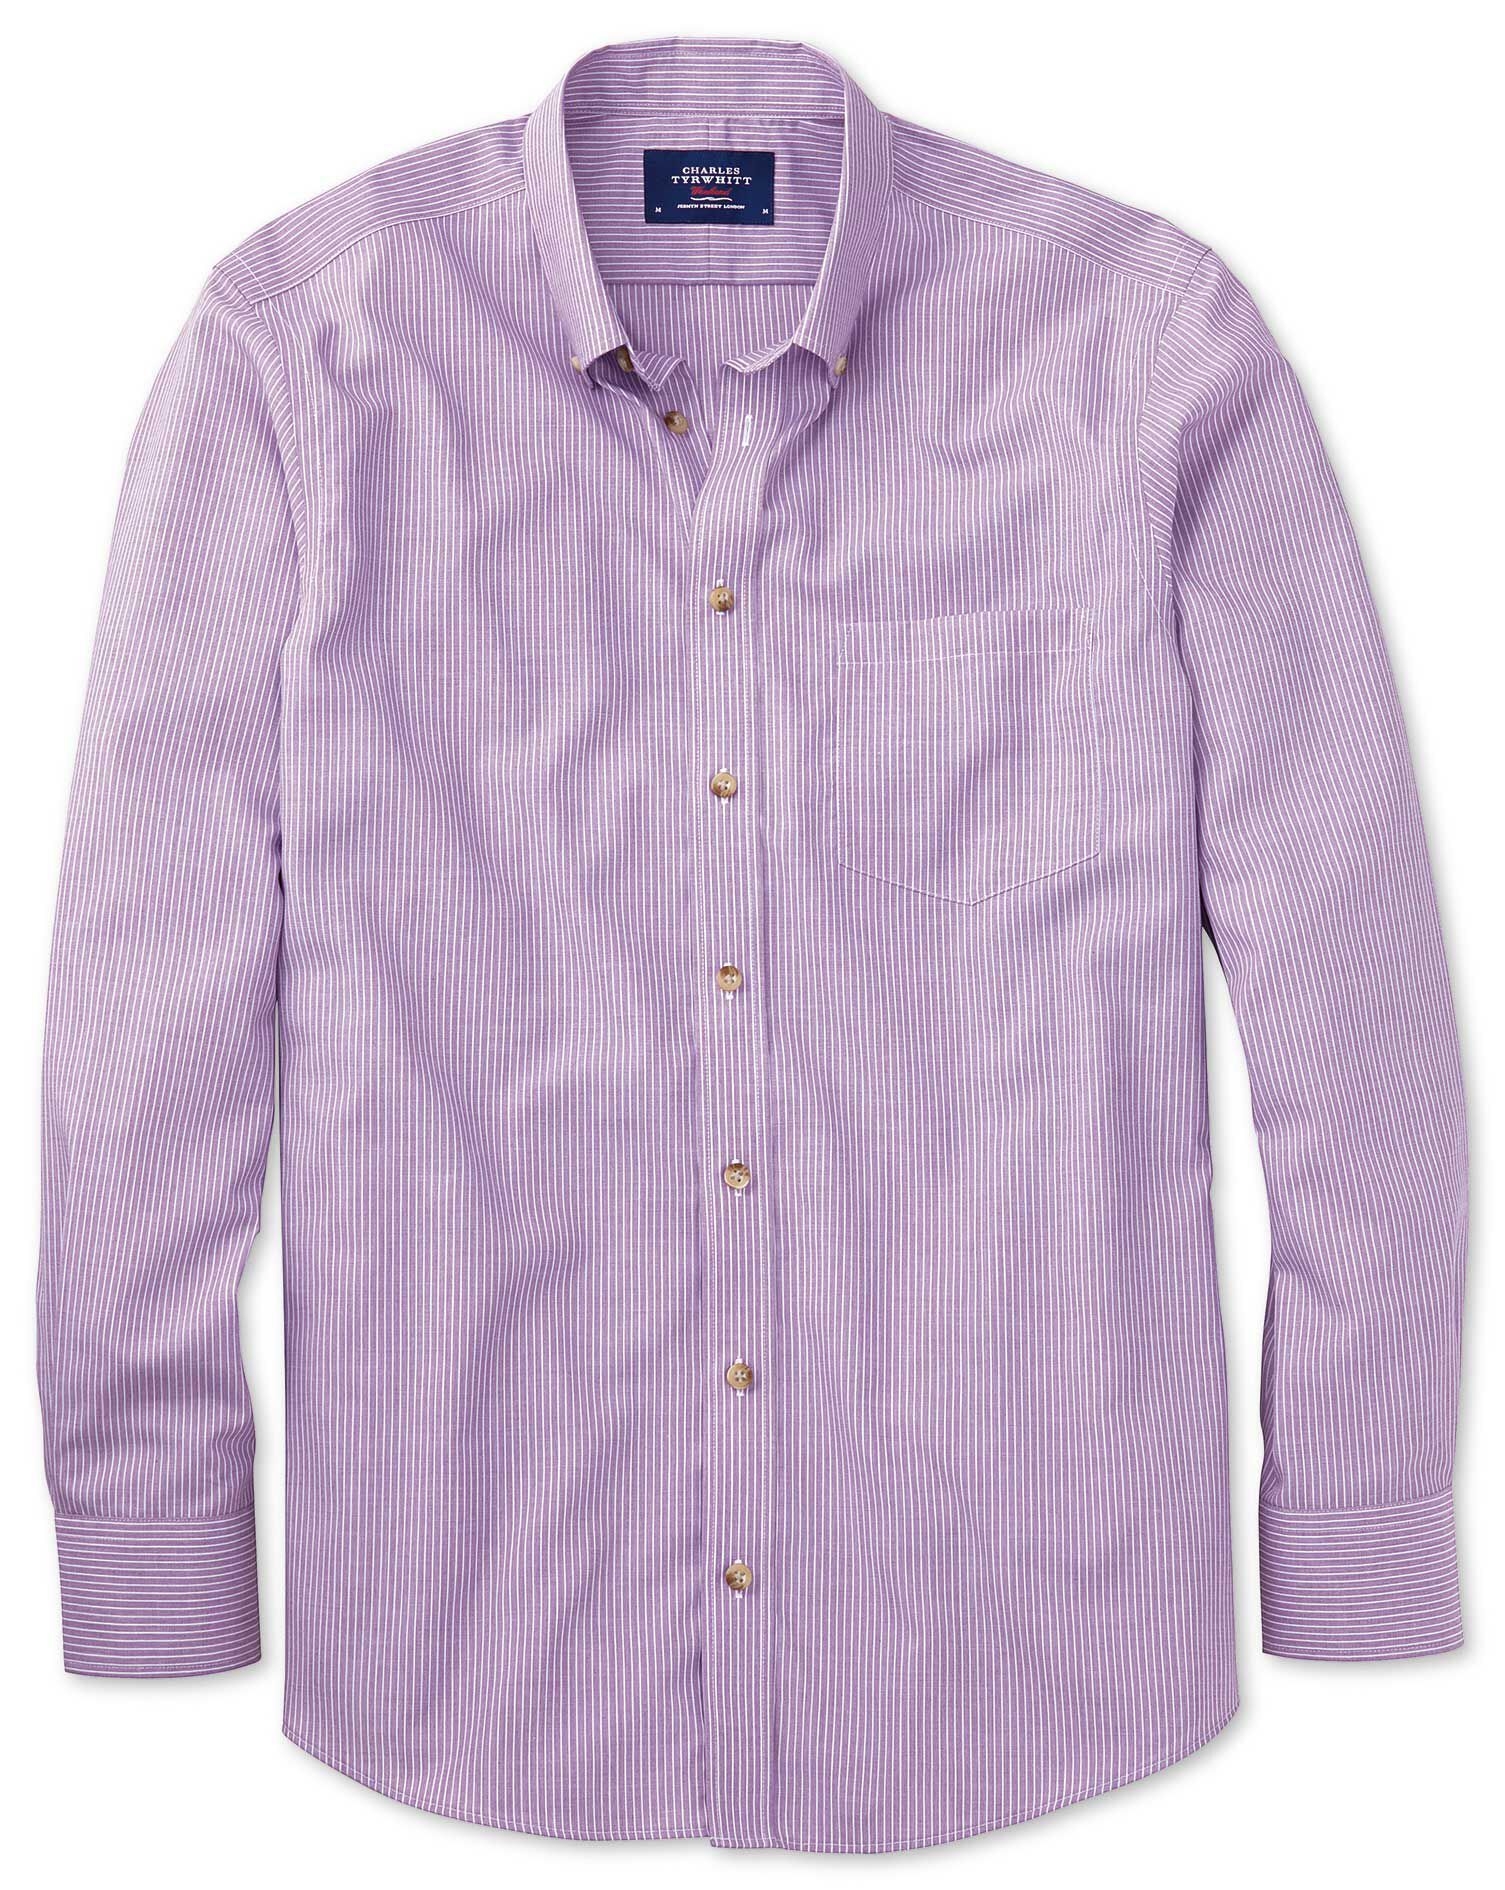 Extra Slim Fit Non-Iron Poplin Lilac Stripe Cotton Shirt Single Cuff Size Medium by Charles Tyrwhitt